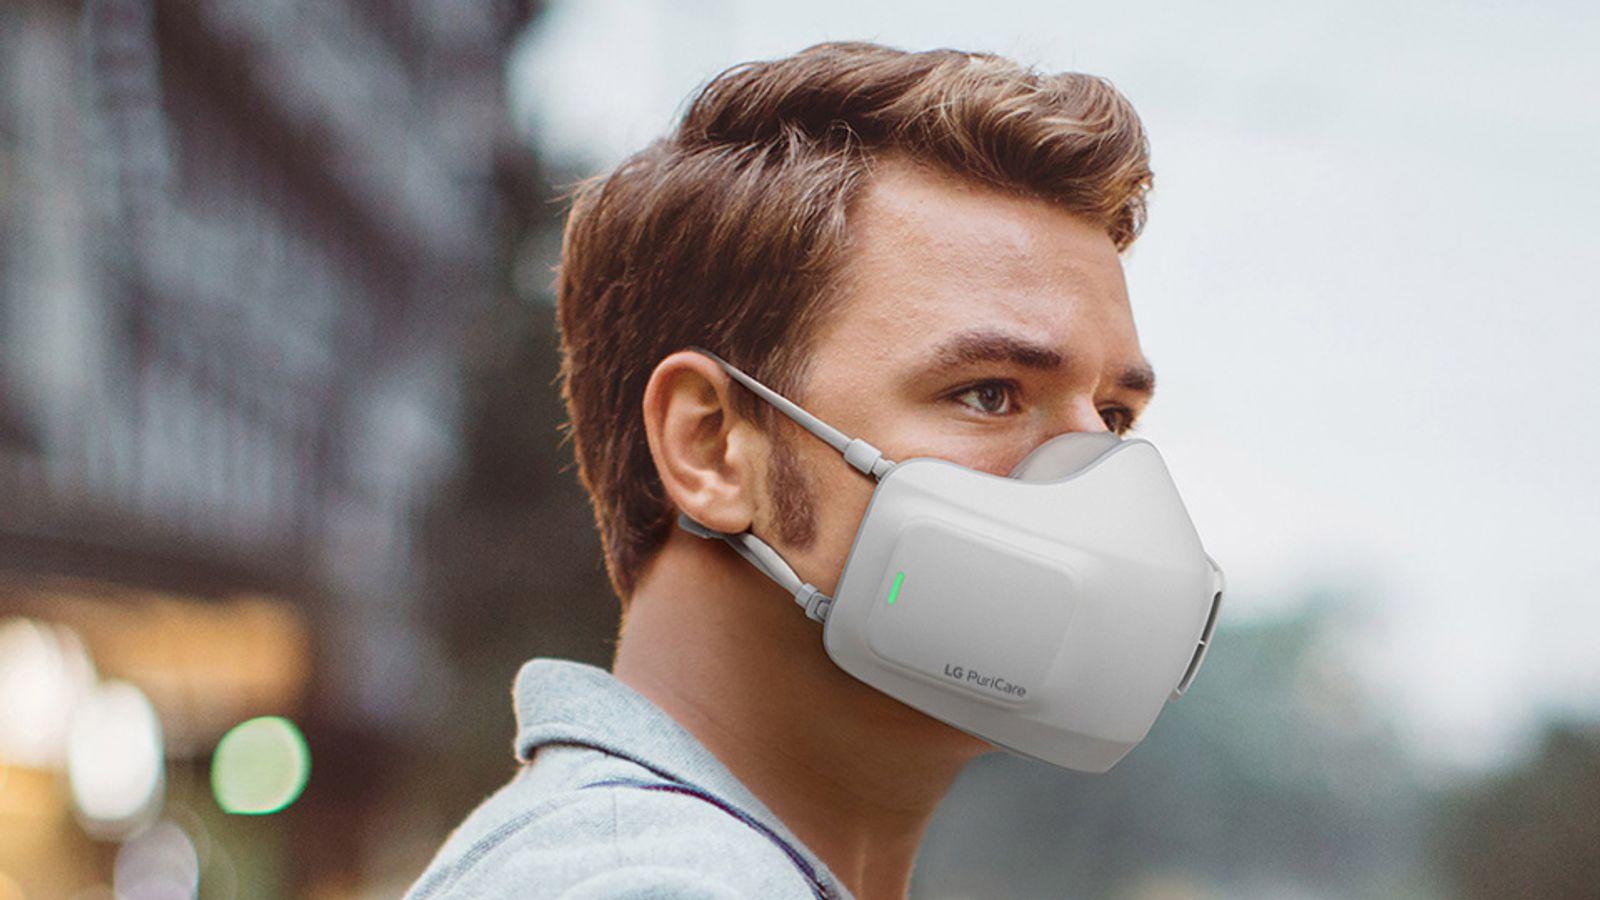 Coronavirus: LG unveils battery-powered face mask dubbed 'wearable air purifier'